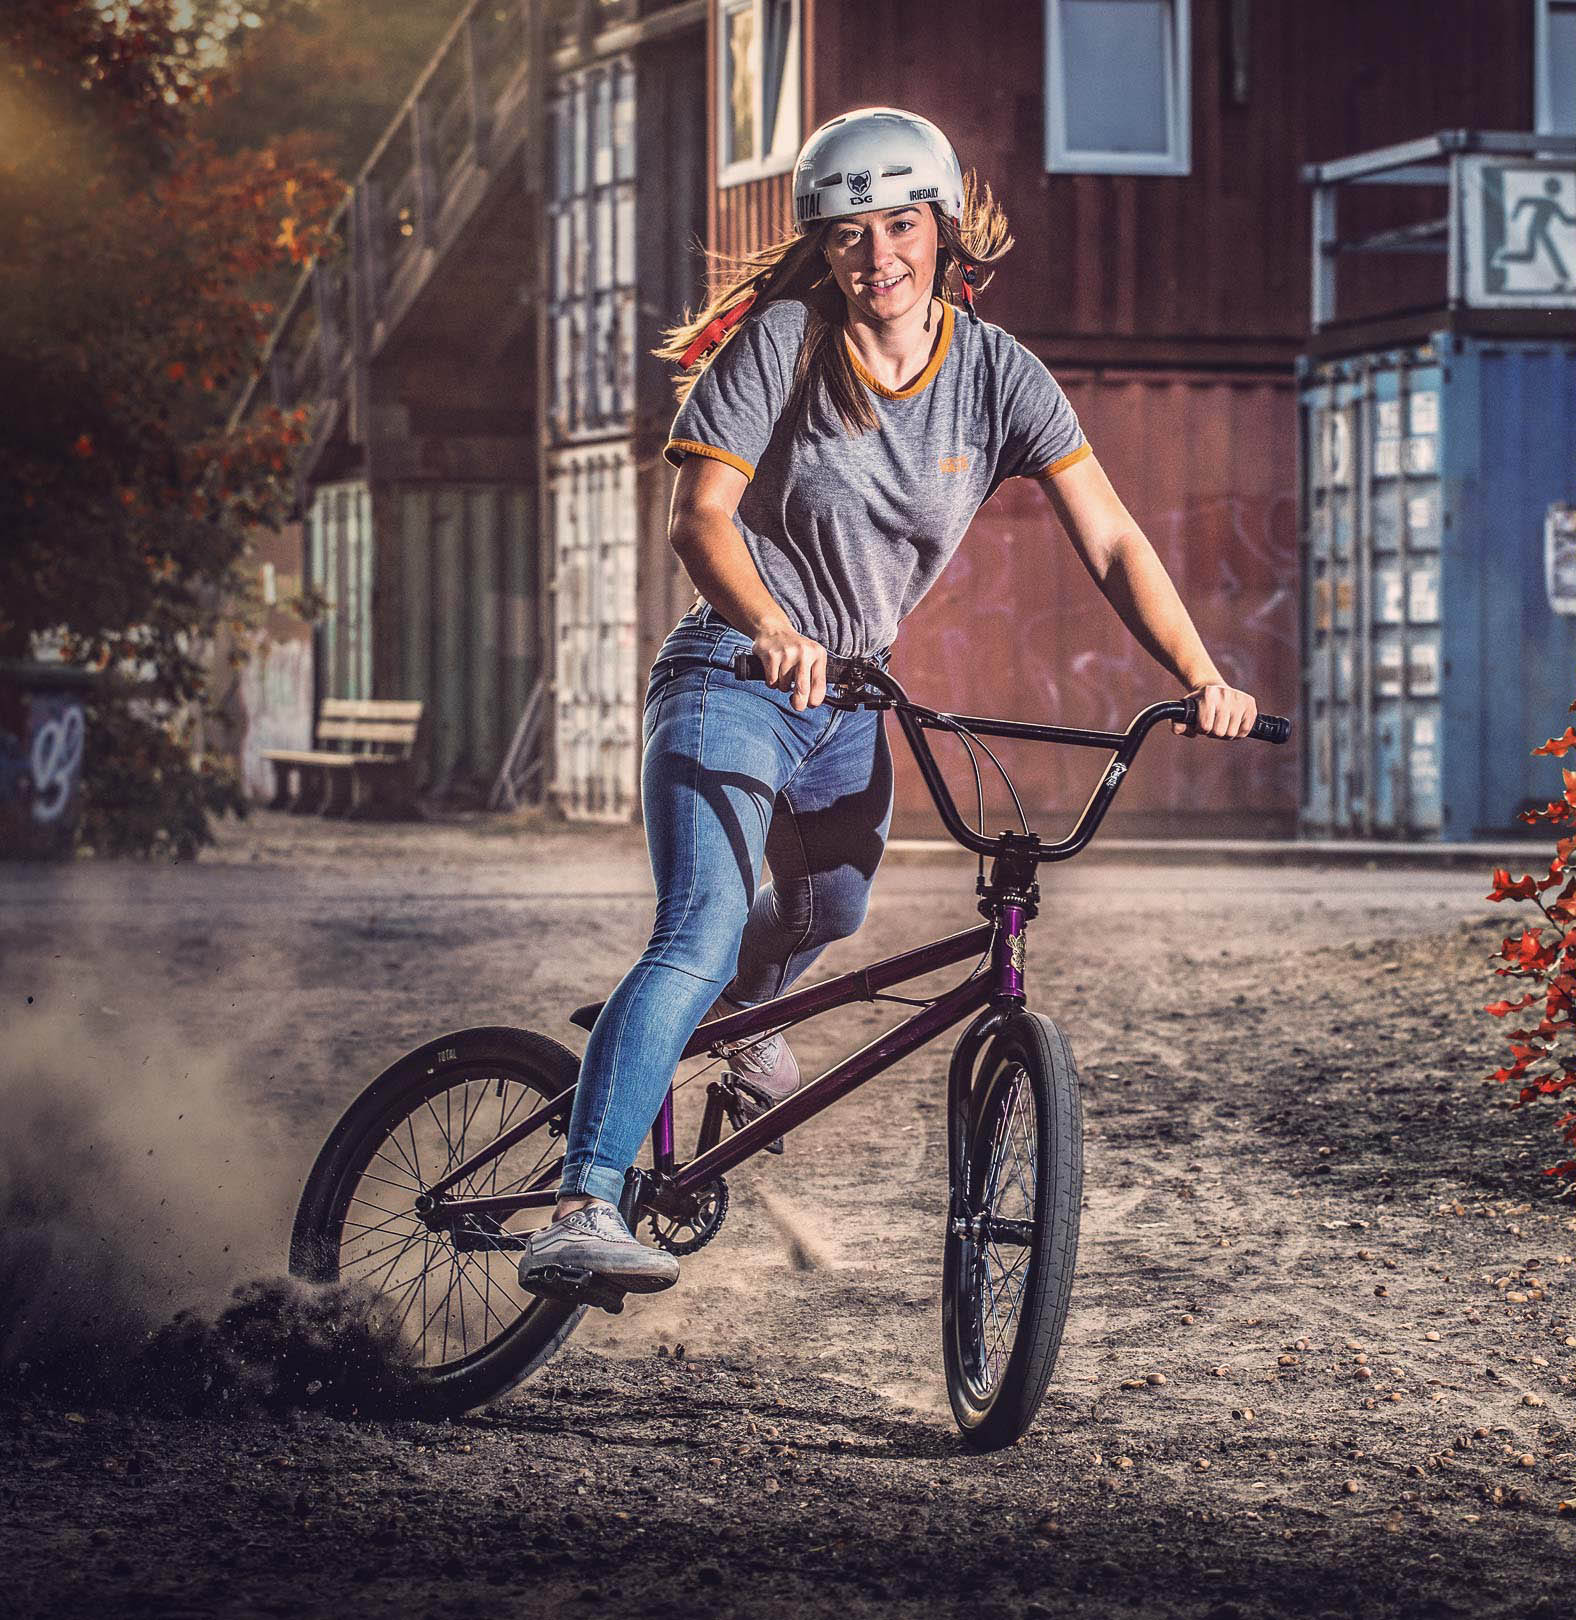 Lara Lessmann BMX TSG team rider